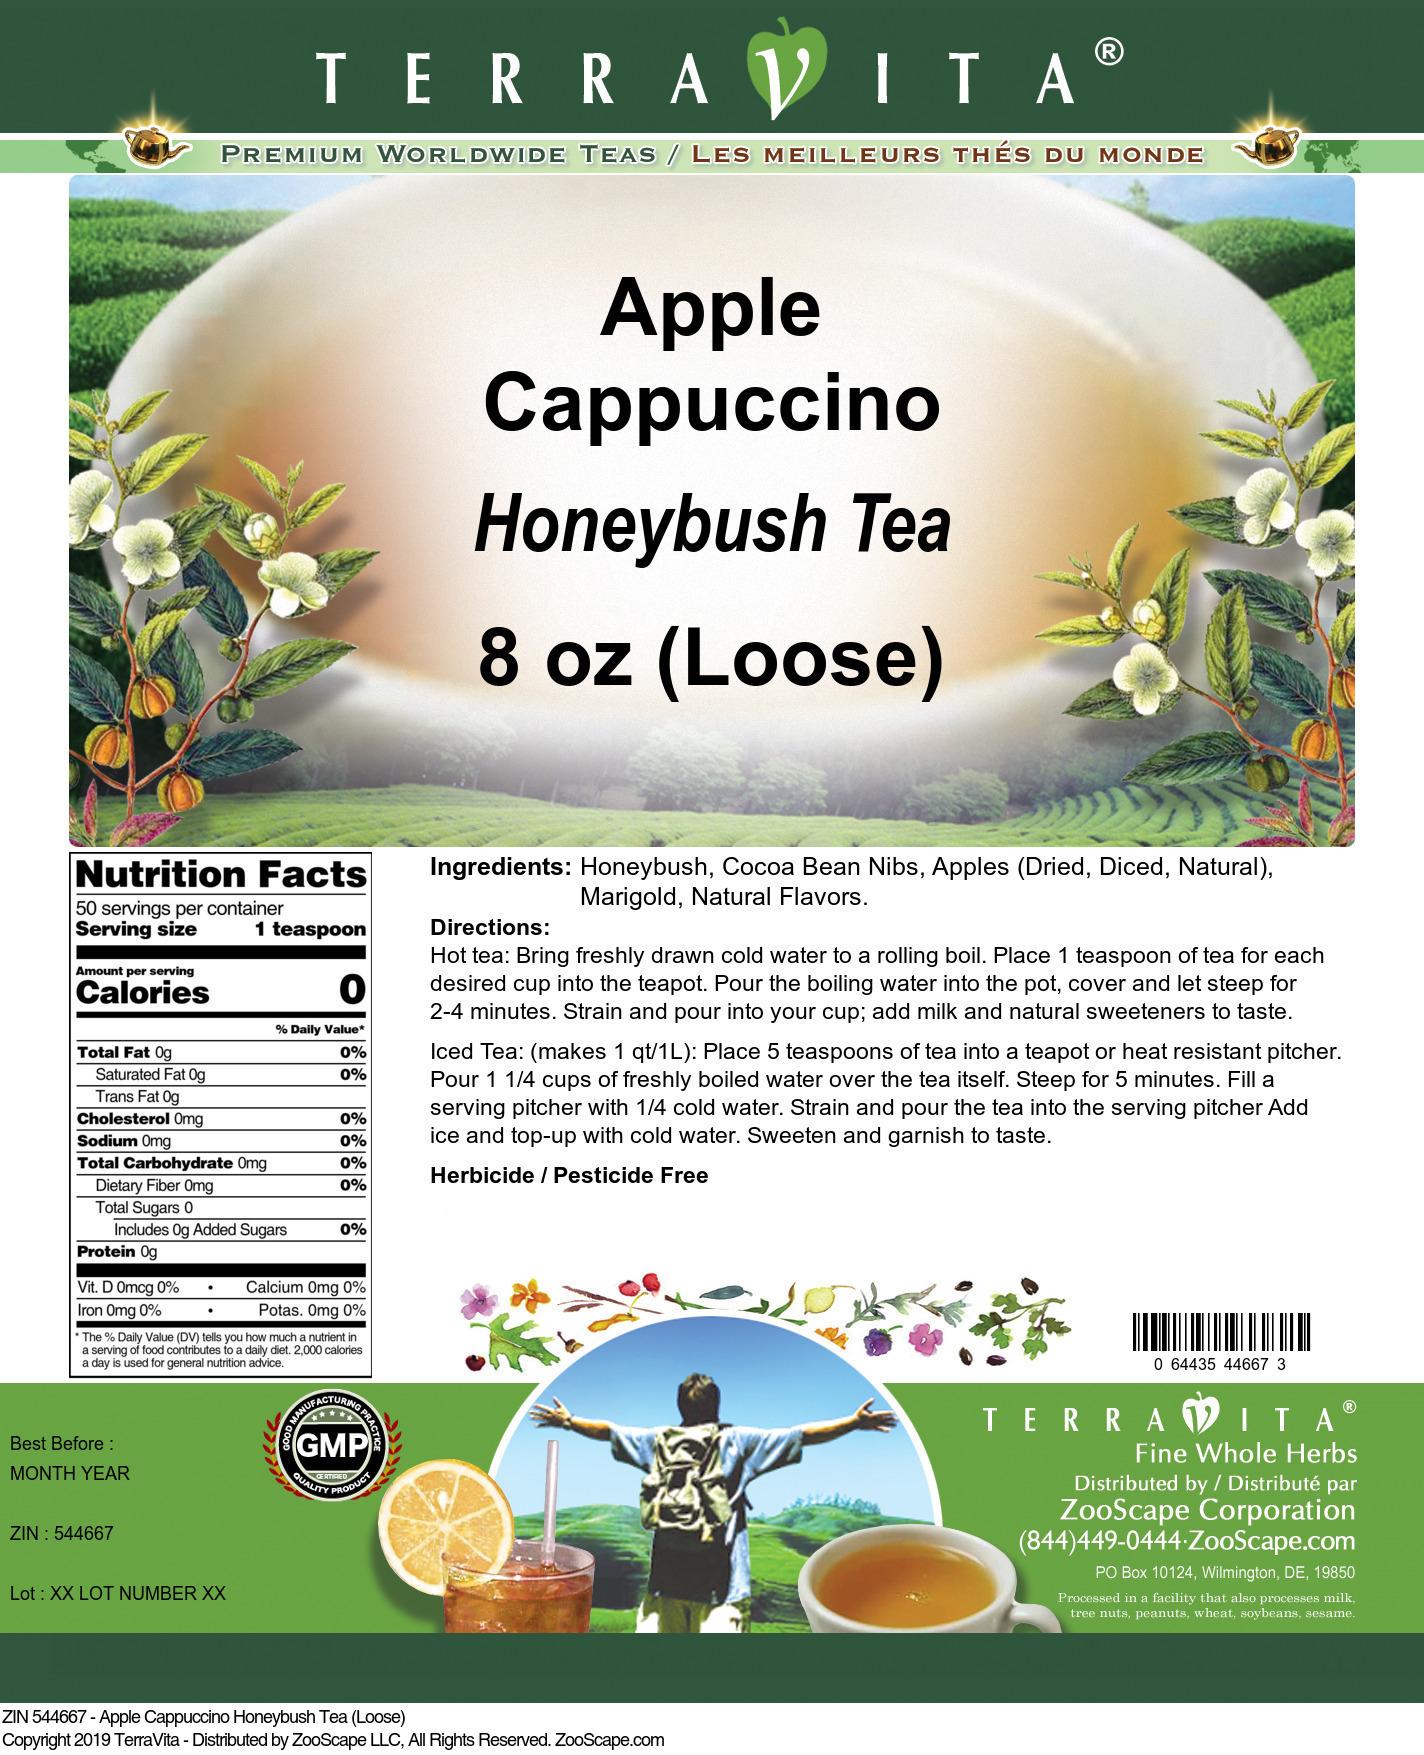 Apple Cappuccino Honeybush Tea (Loose)